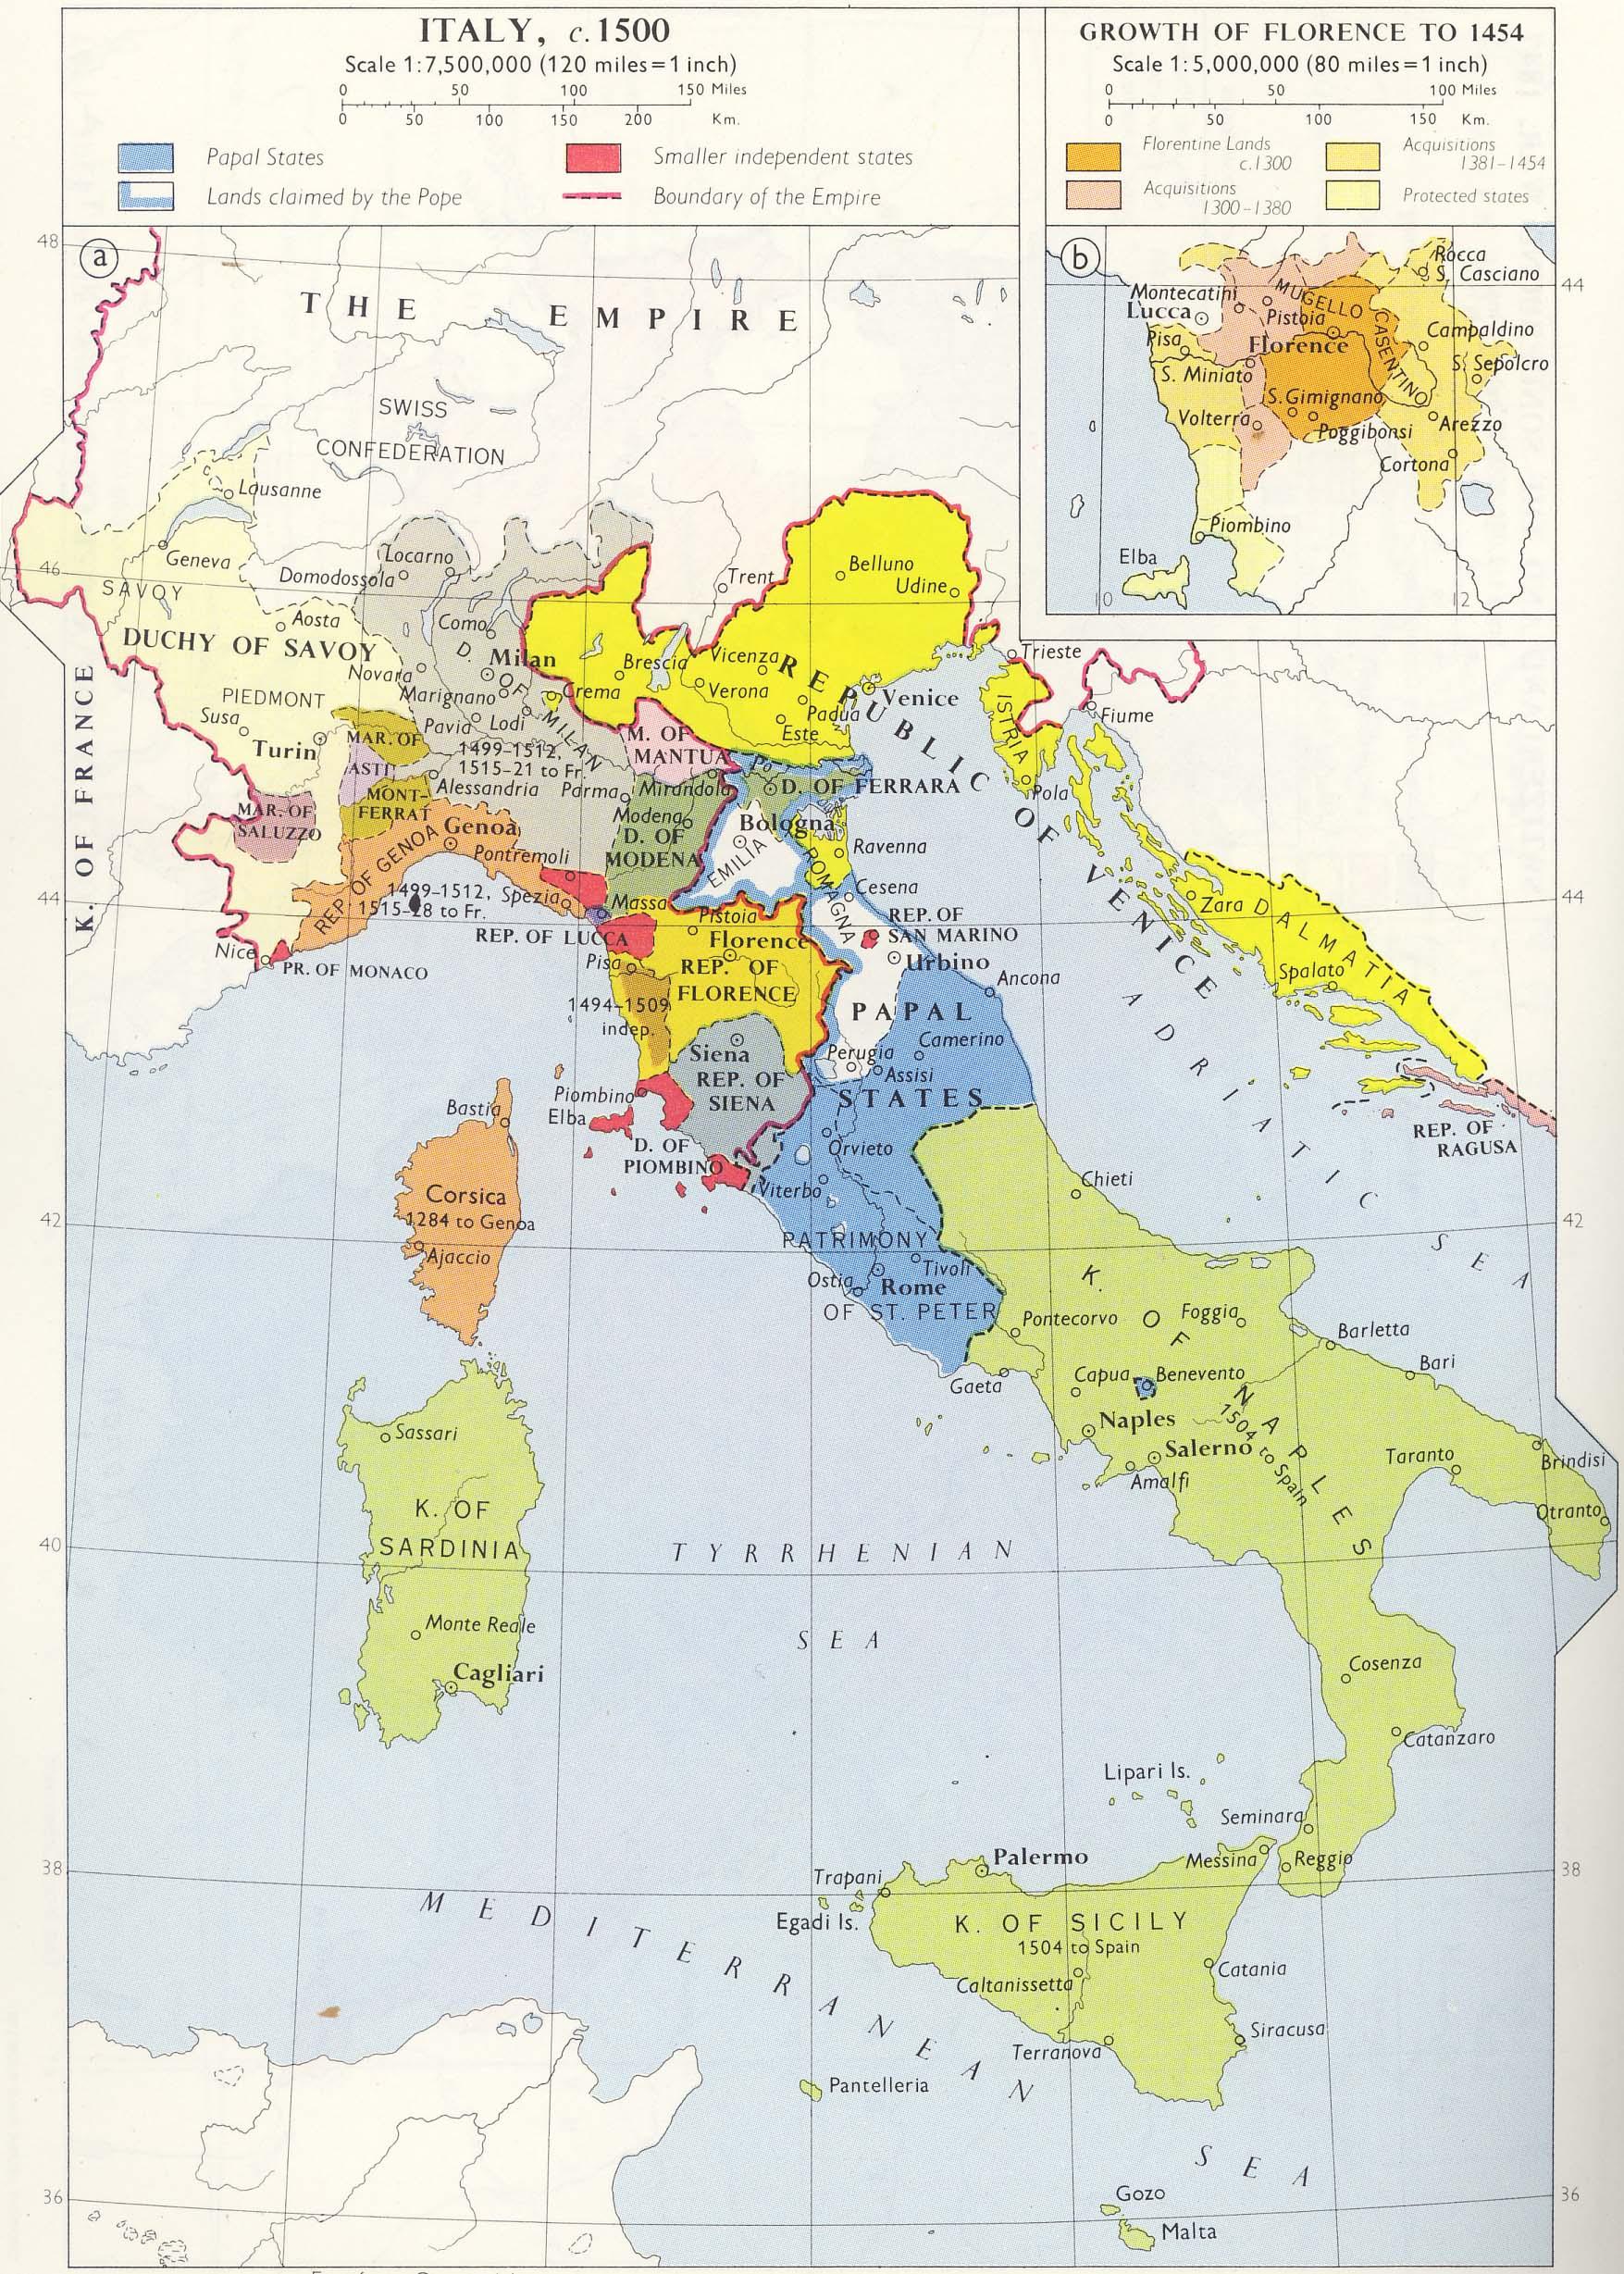 Italy Map 1500.Basicmodule